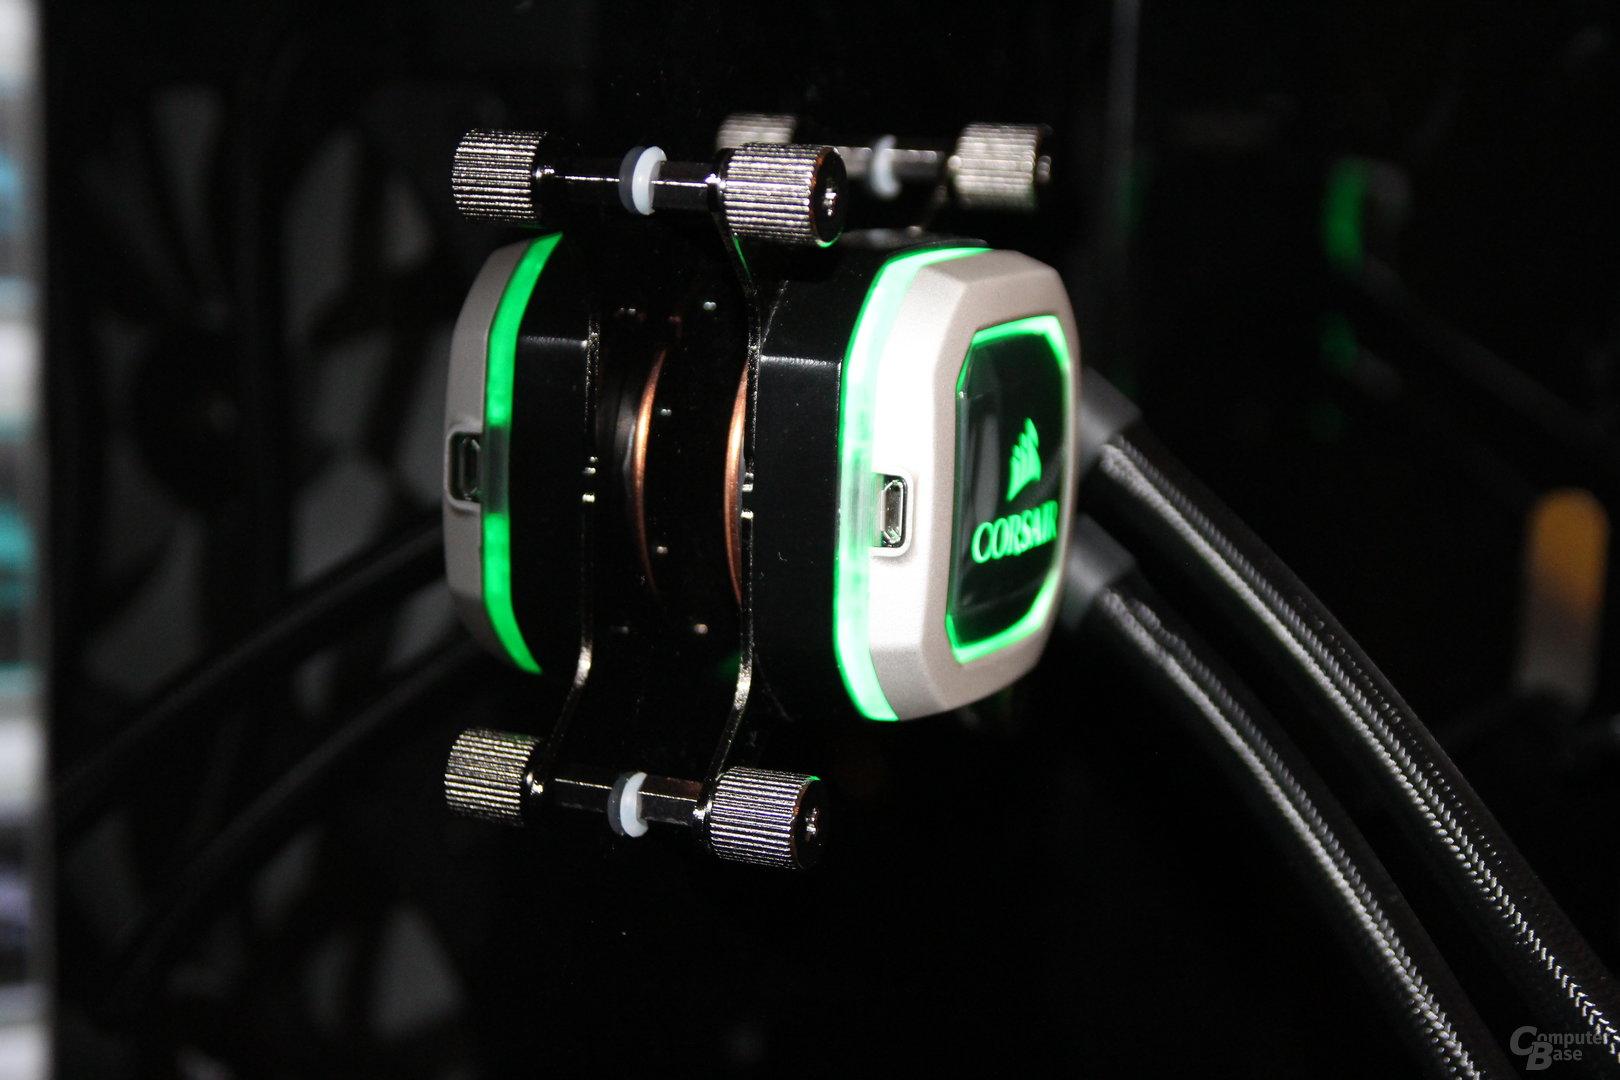 Corsair RGB-Hydro-Kompaktwasserkühlung